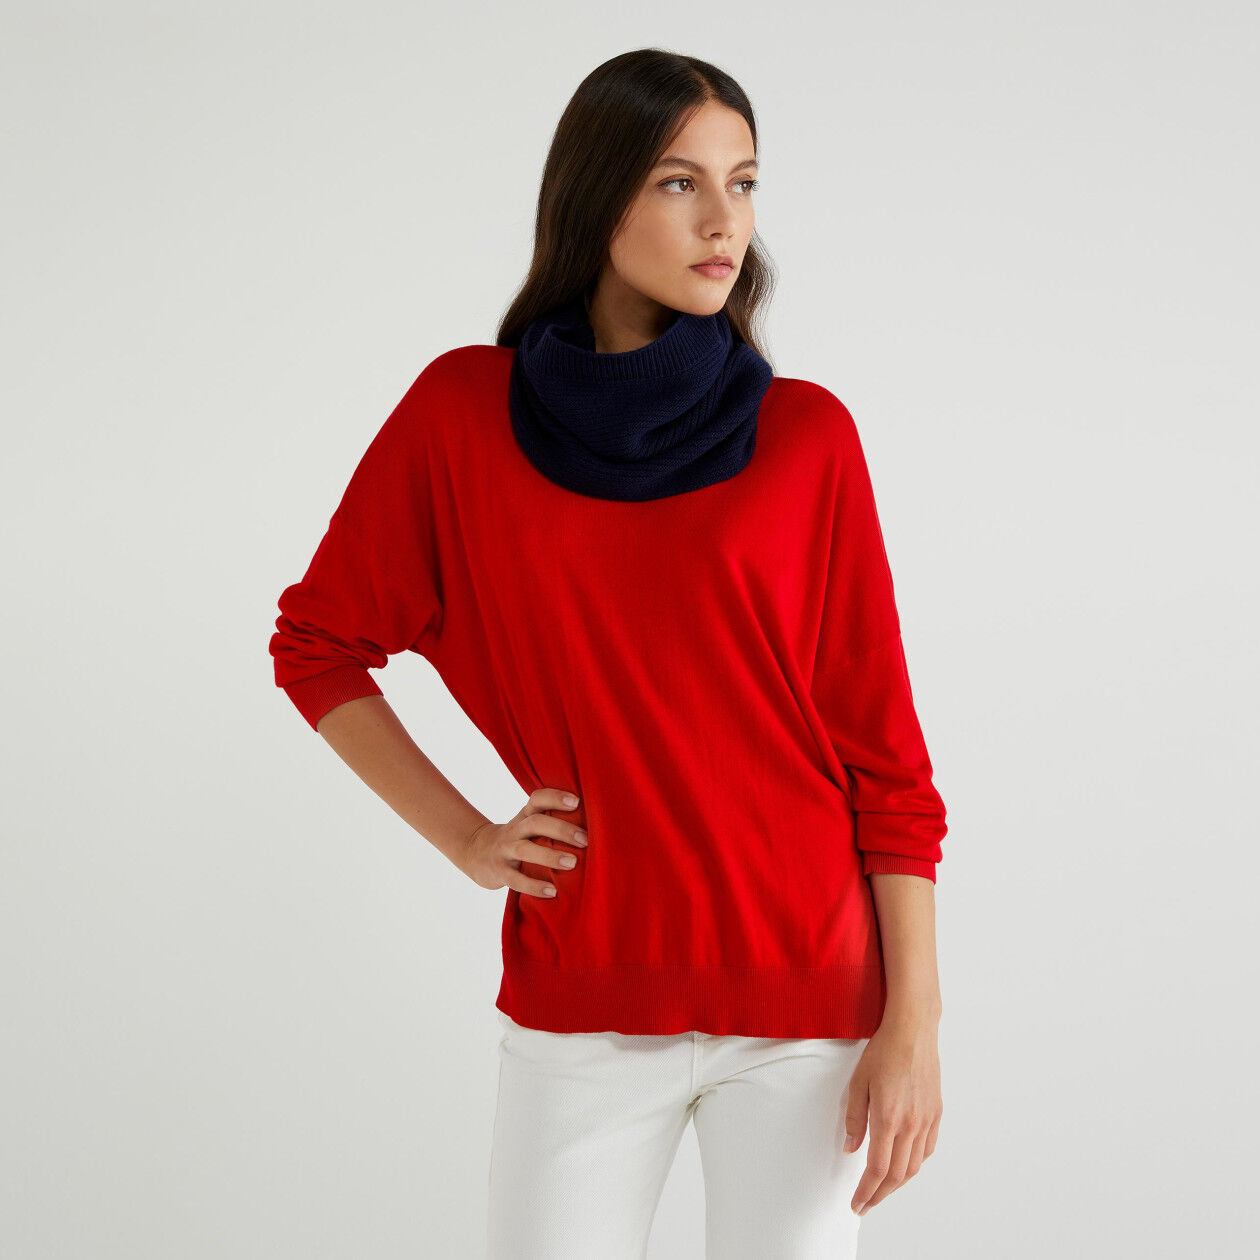 Wool blend neck warmers